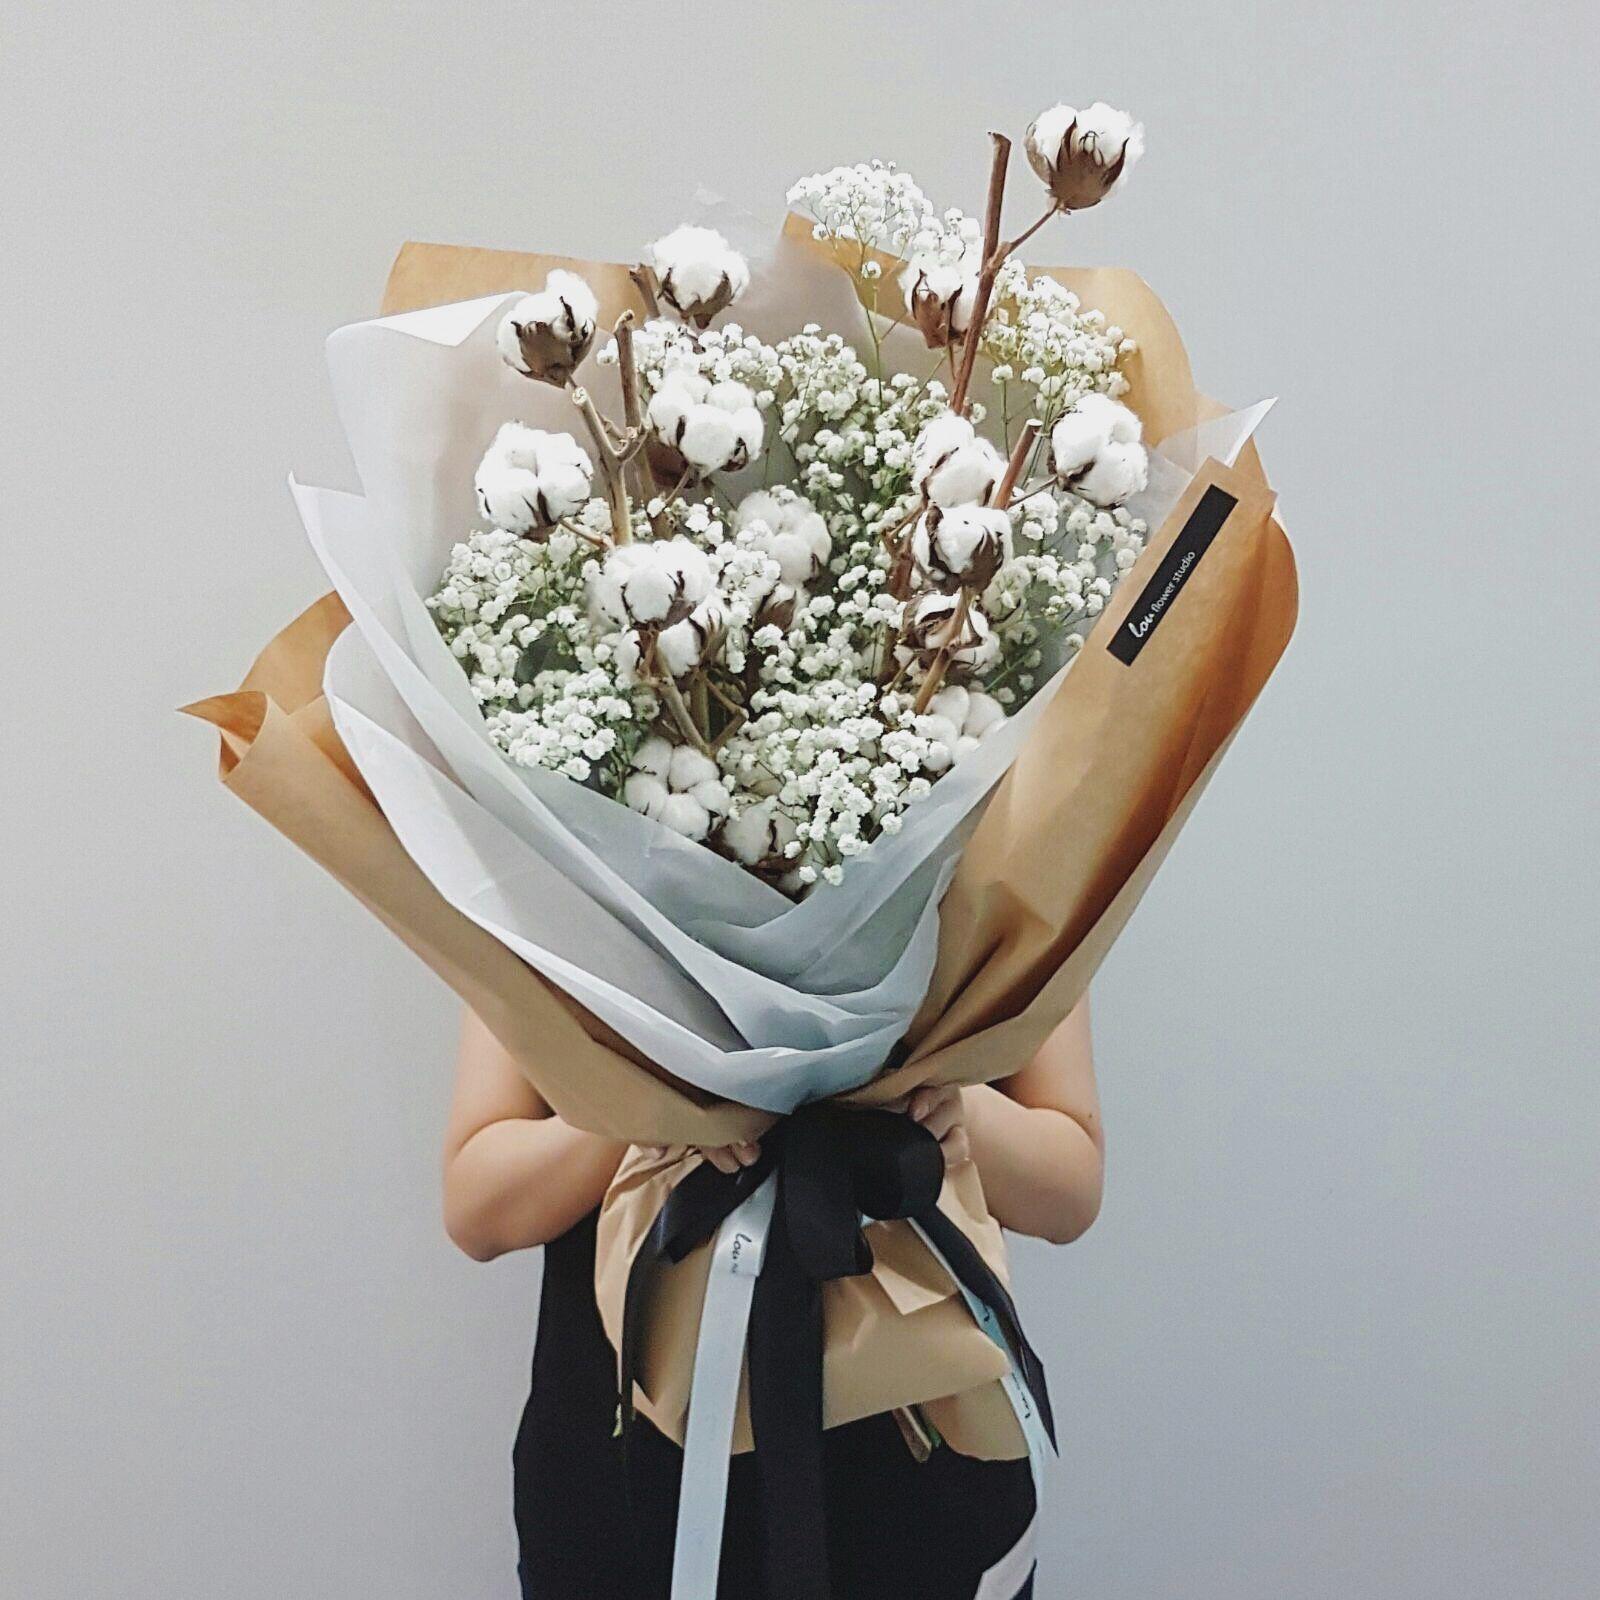 Giant Fluffy Bouquet Of Cotton And Baby S Breath Cottonbouquet Flowers Bouquet Gift Dried Flower Bouquet Cotton Bouquet